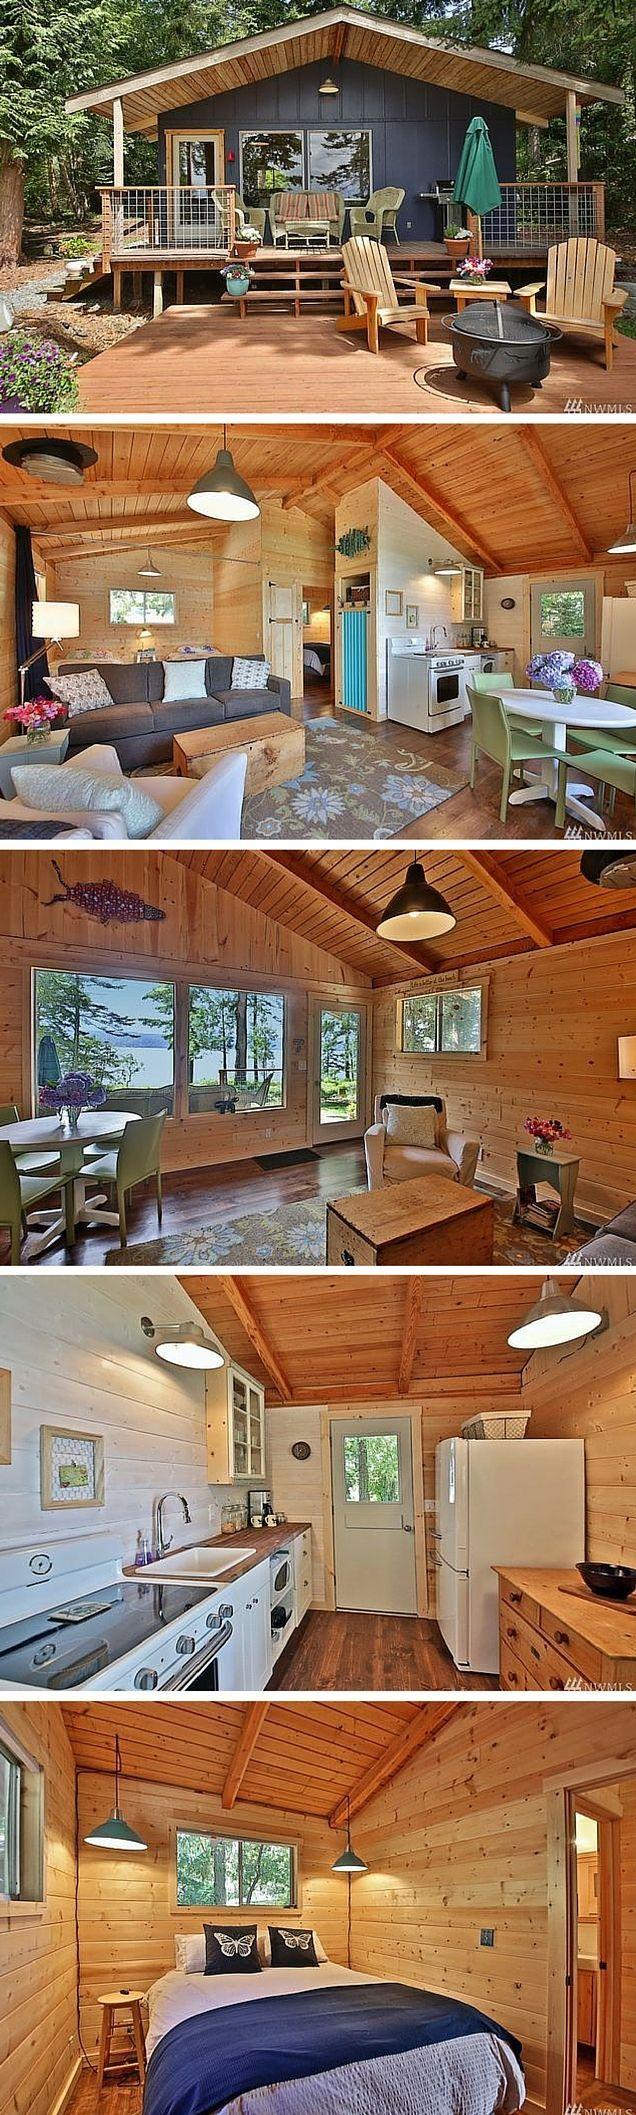 1000 Ideas About Home Decor Websites On Pinterest Home Decor